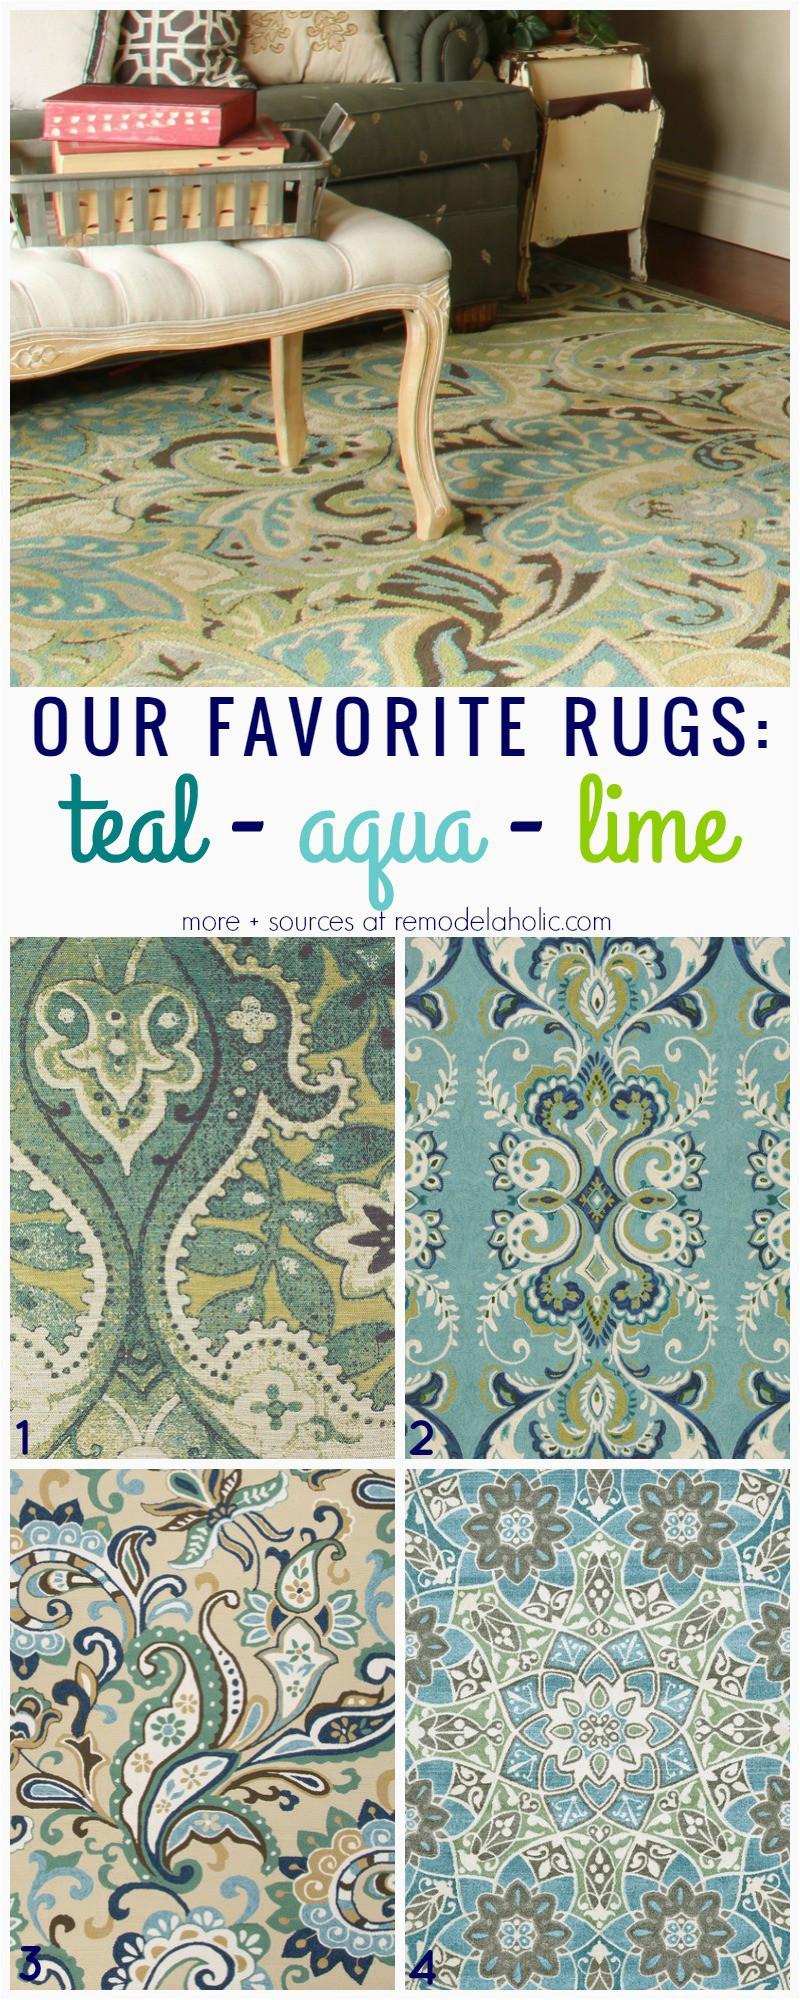 Favorite rugs teal aqua lime 1 4 Remodelaholic